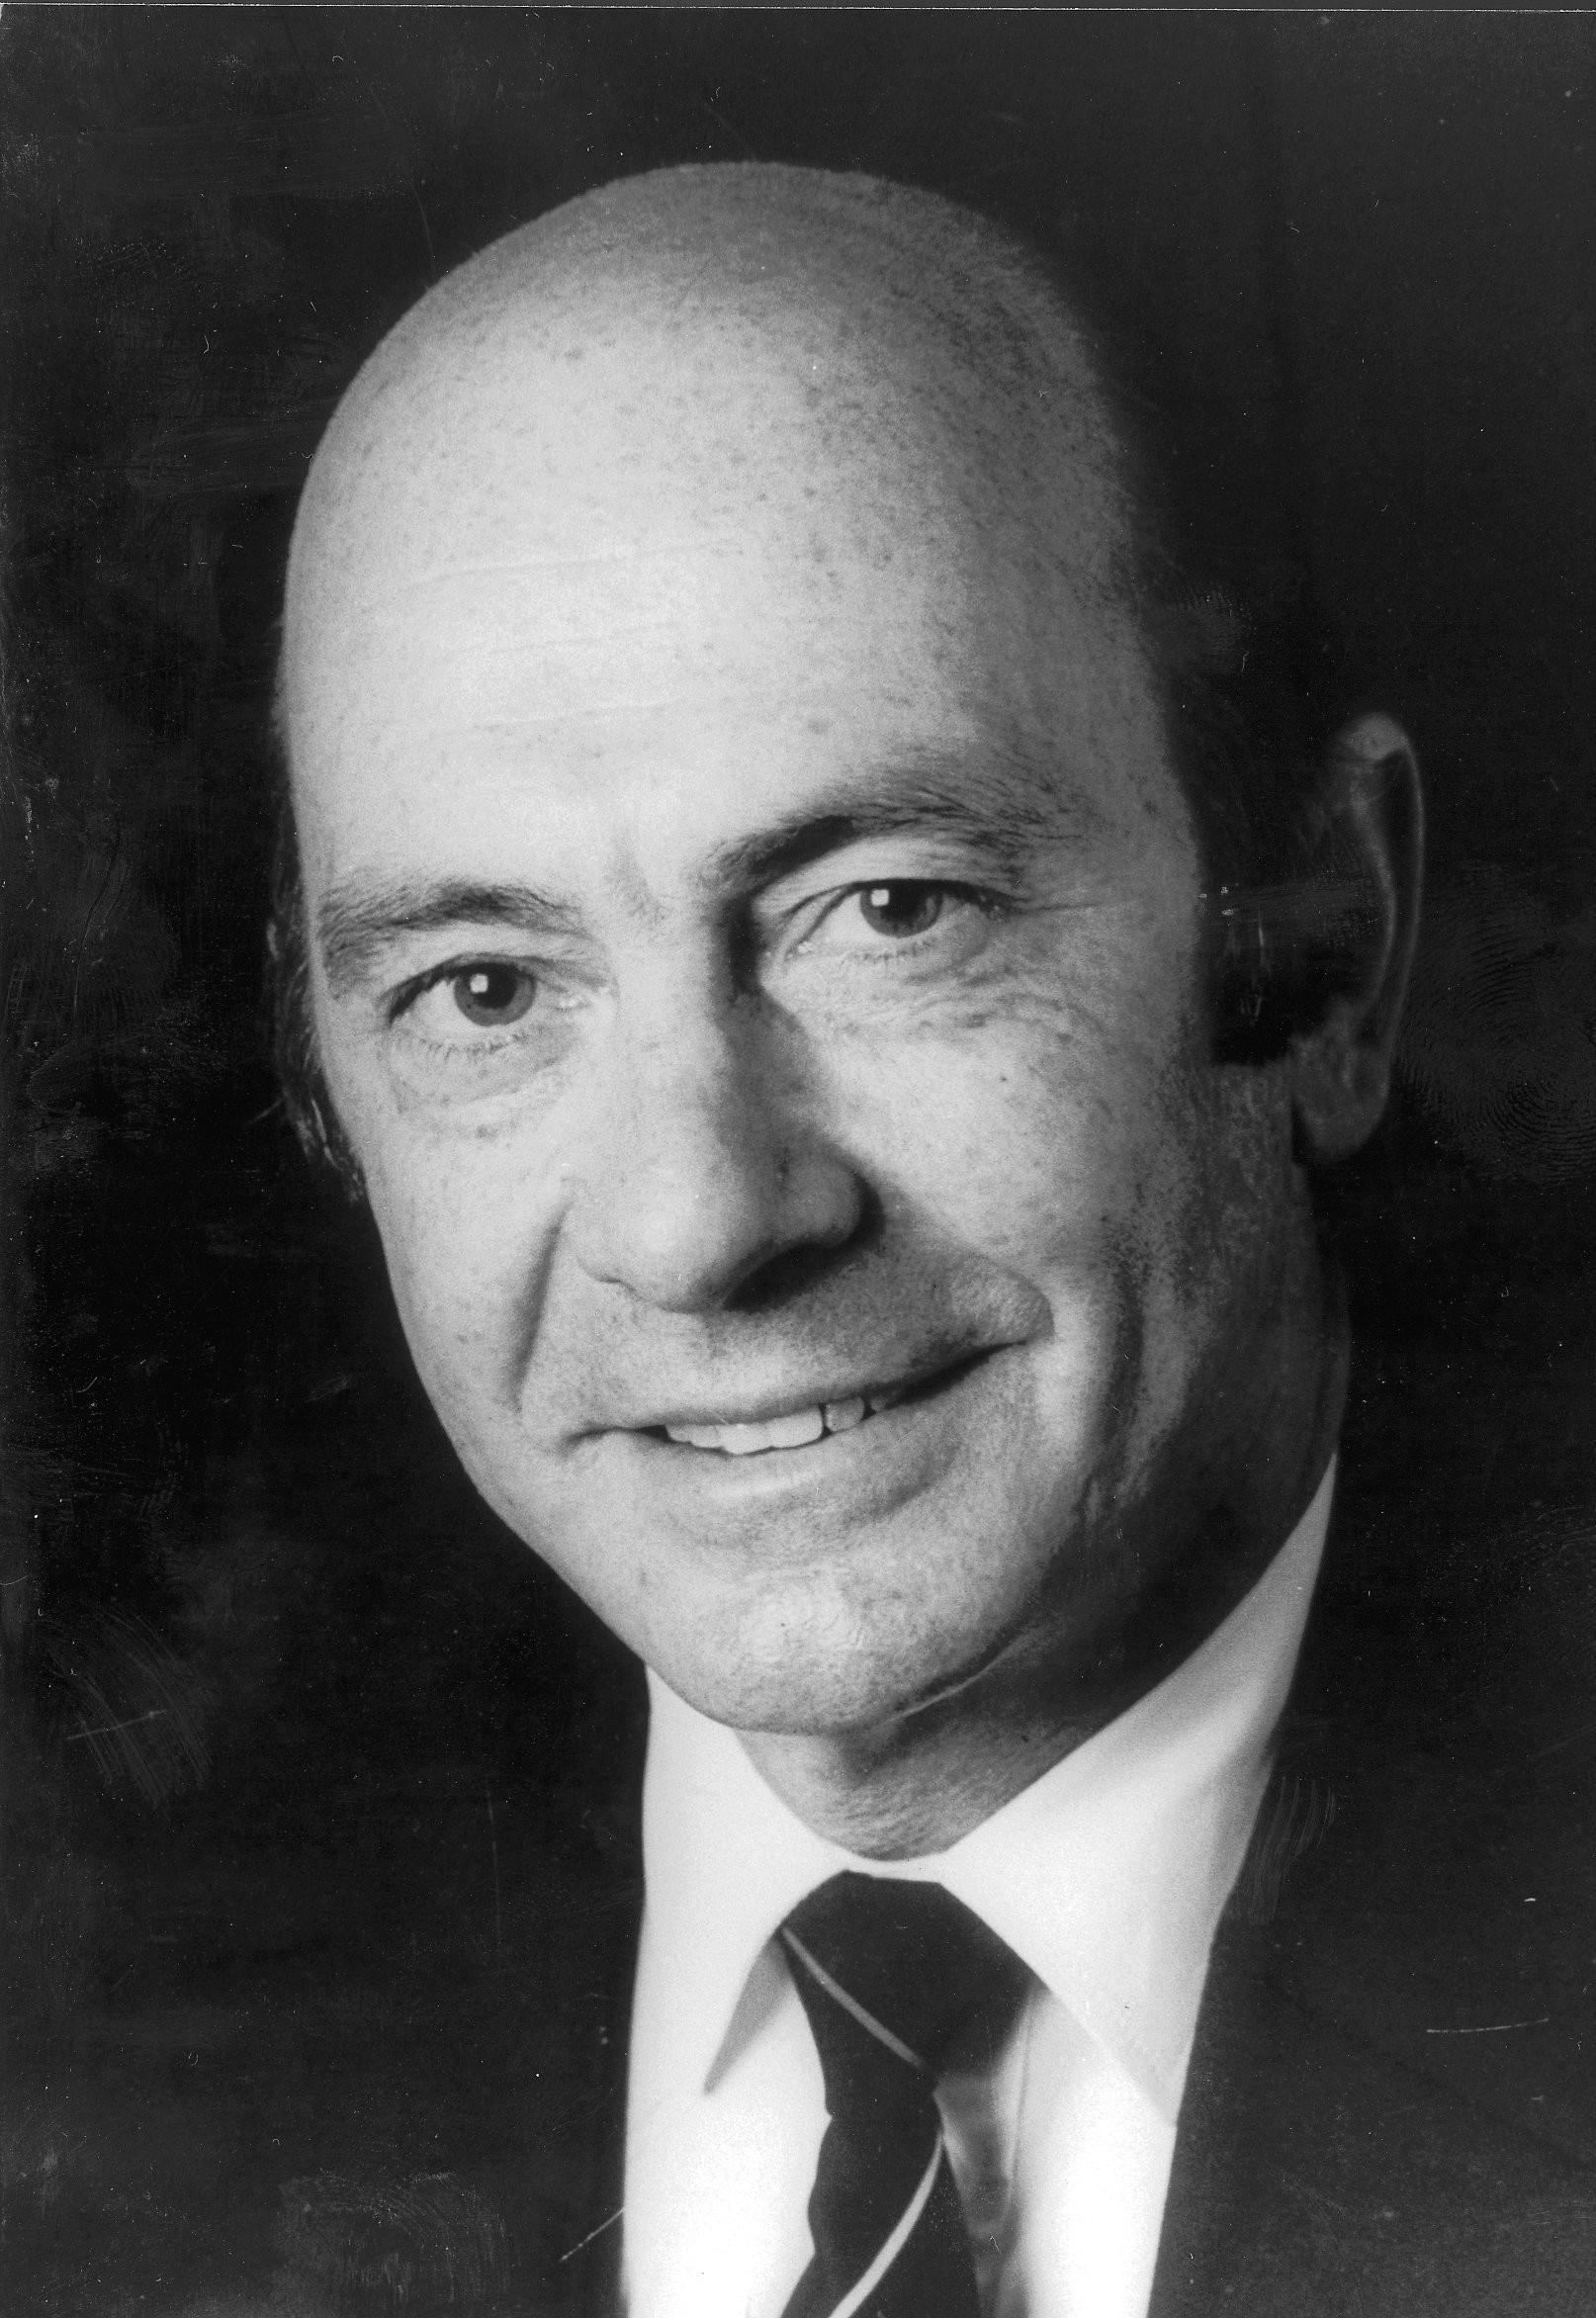 Manfred Wörner, 1982